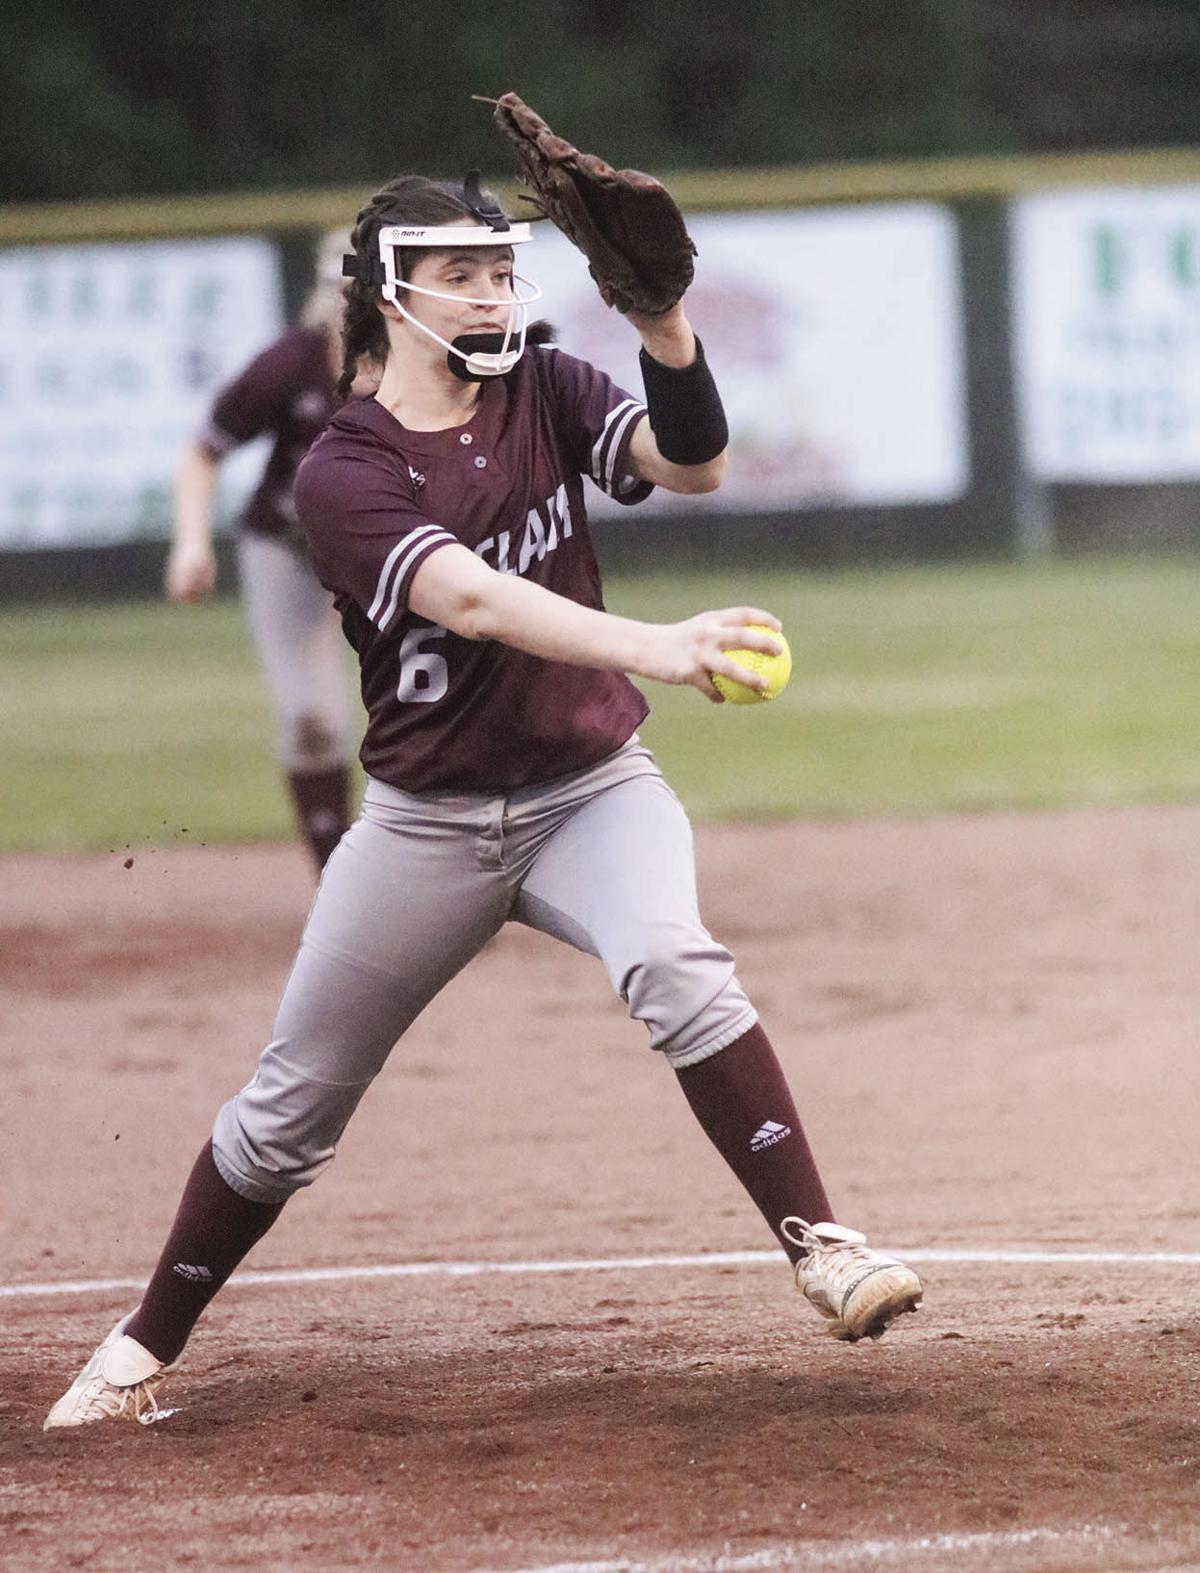 SCCHS pitcher Amber Niles